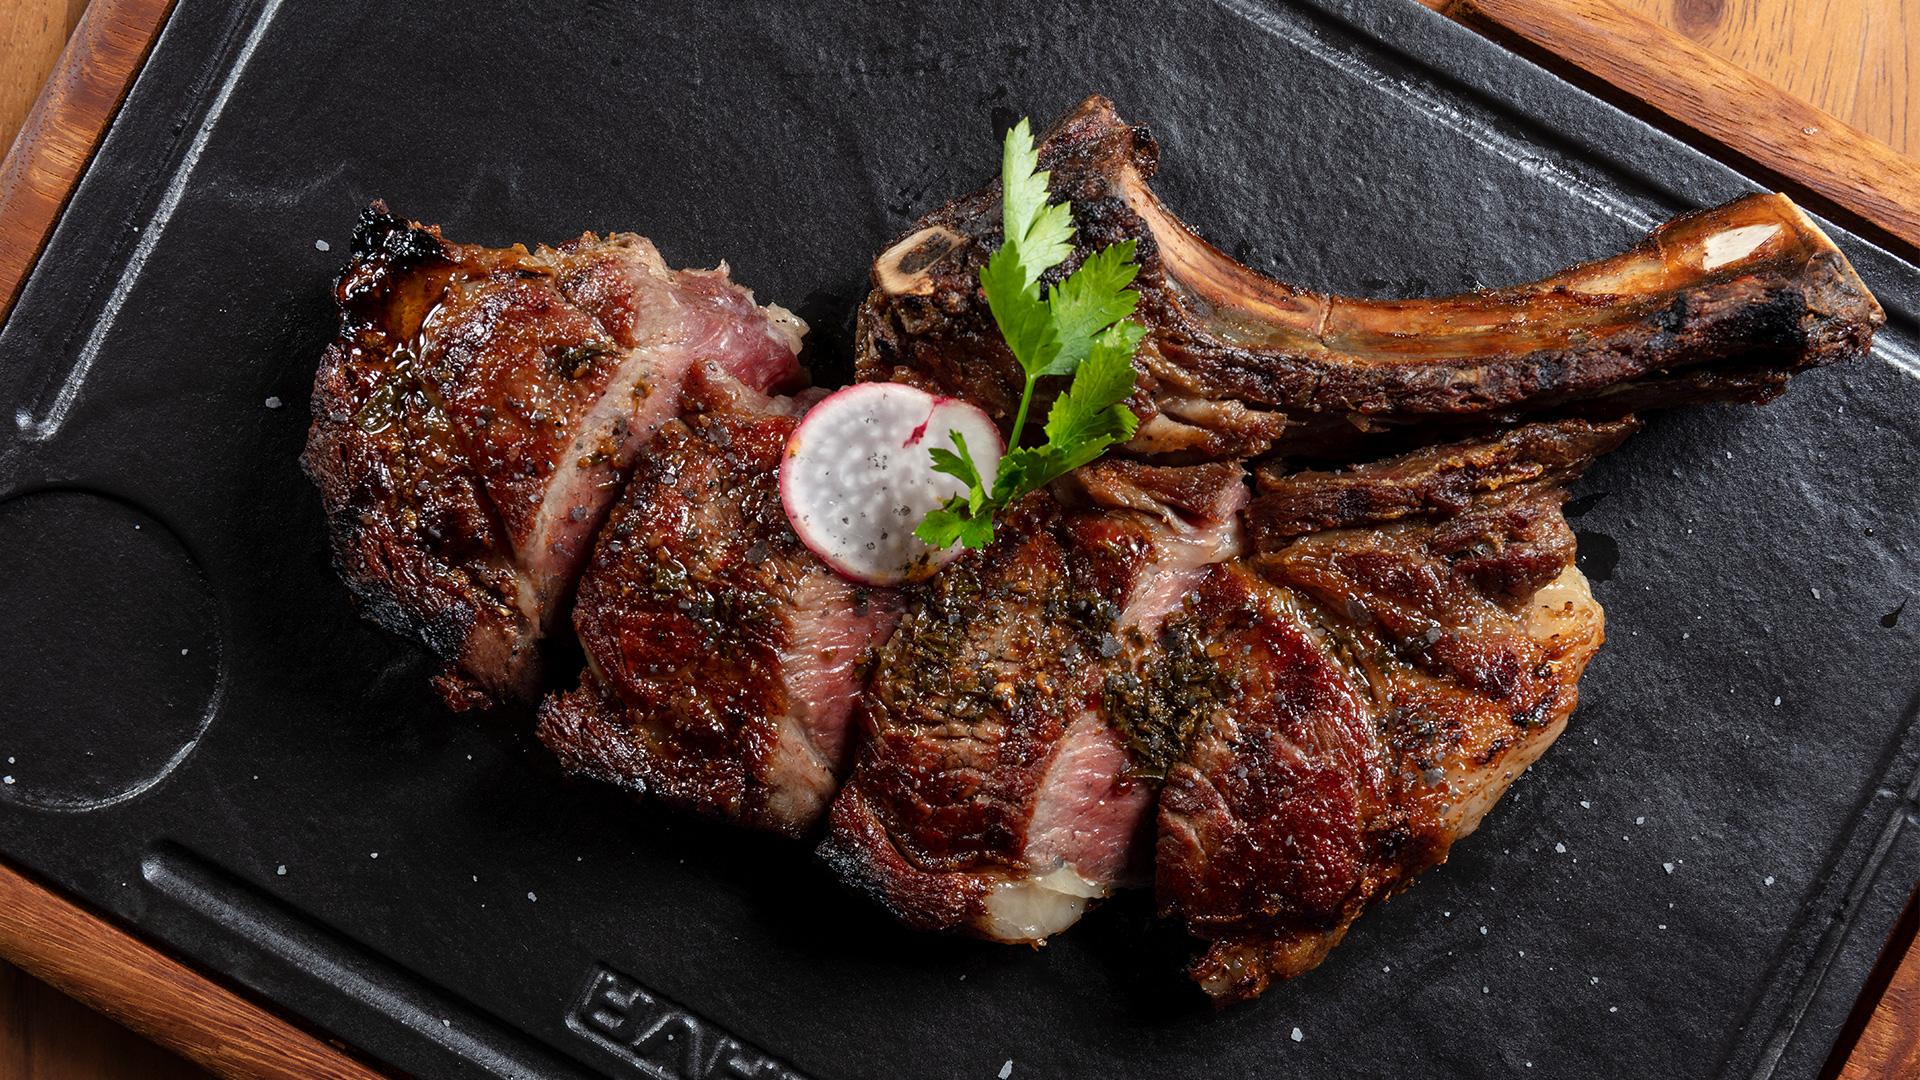 Corte carne en restaurante Bocados